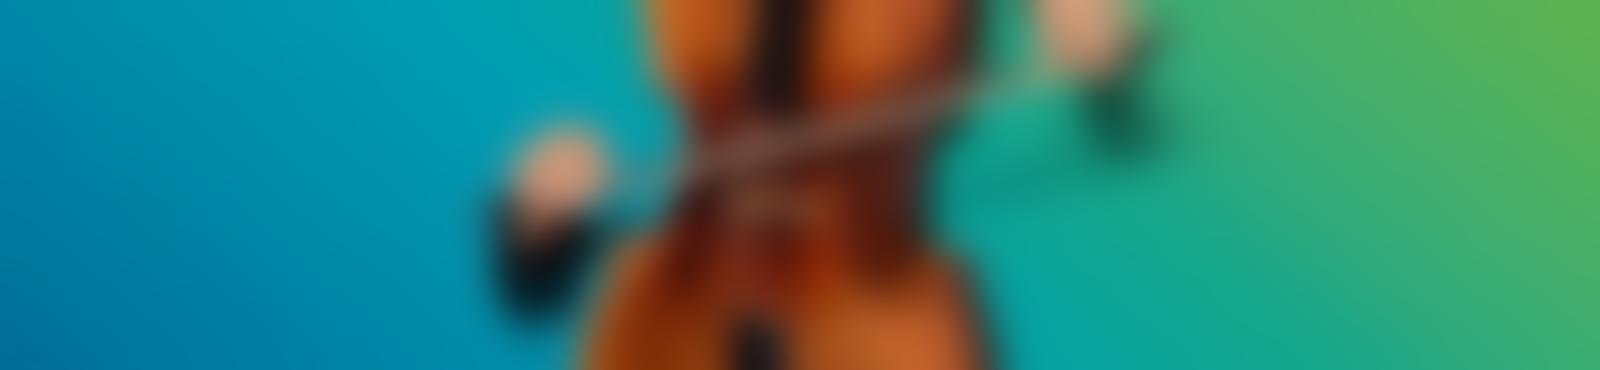 Blurred bd60c319 b0f4 482f 8902 24bd4ea48627